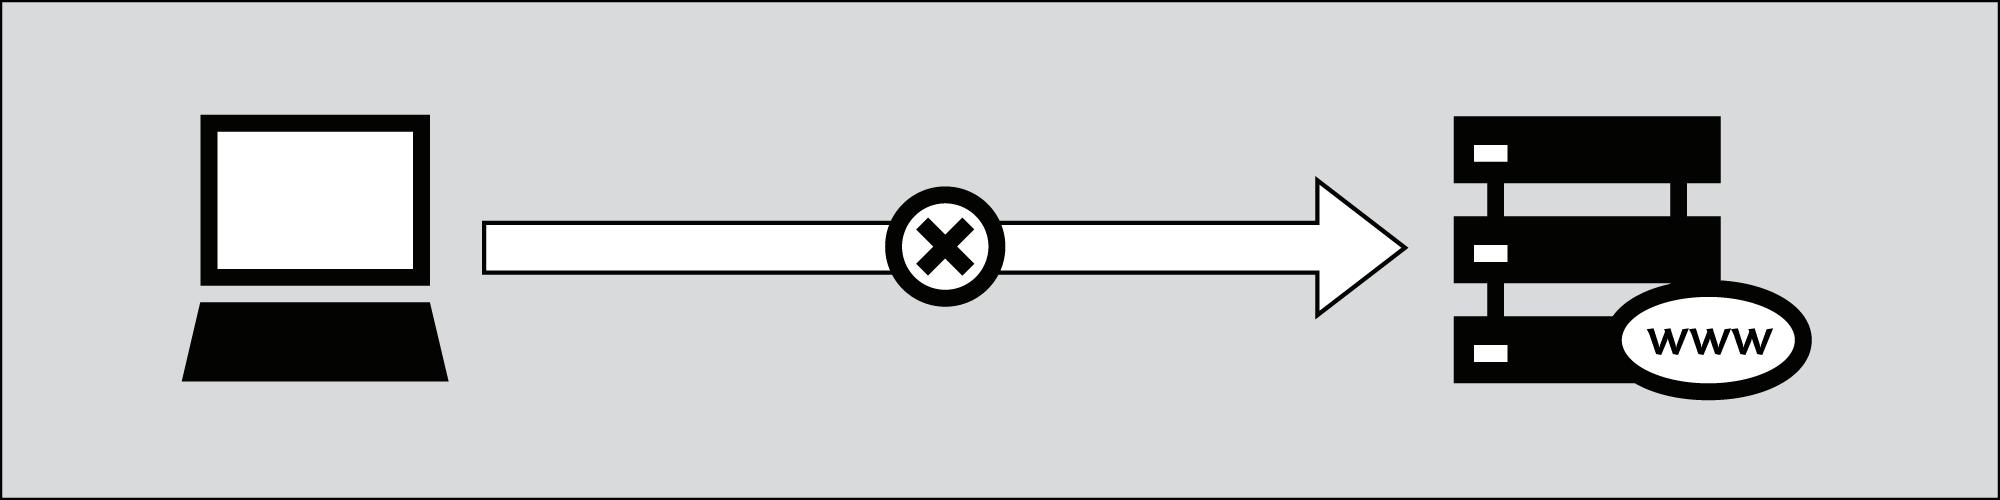 Yorke Eraser Torrent